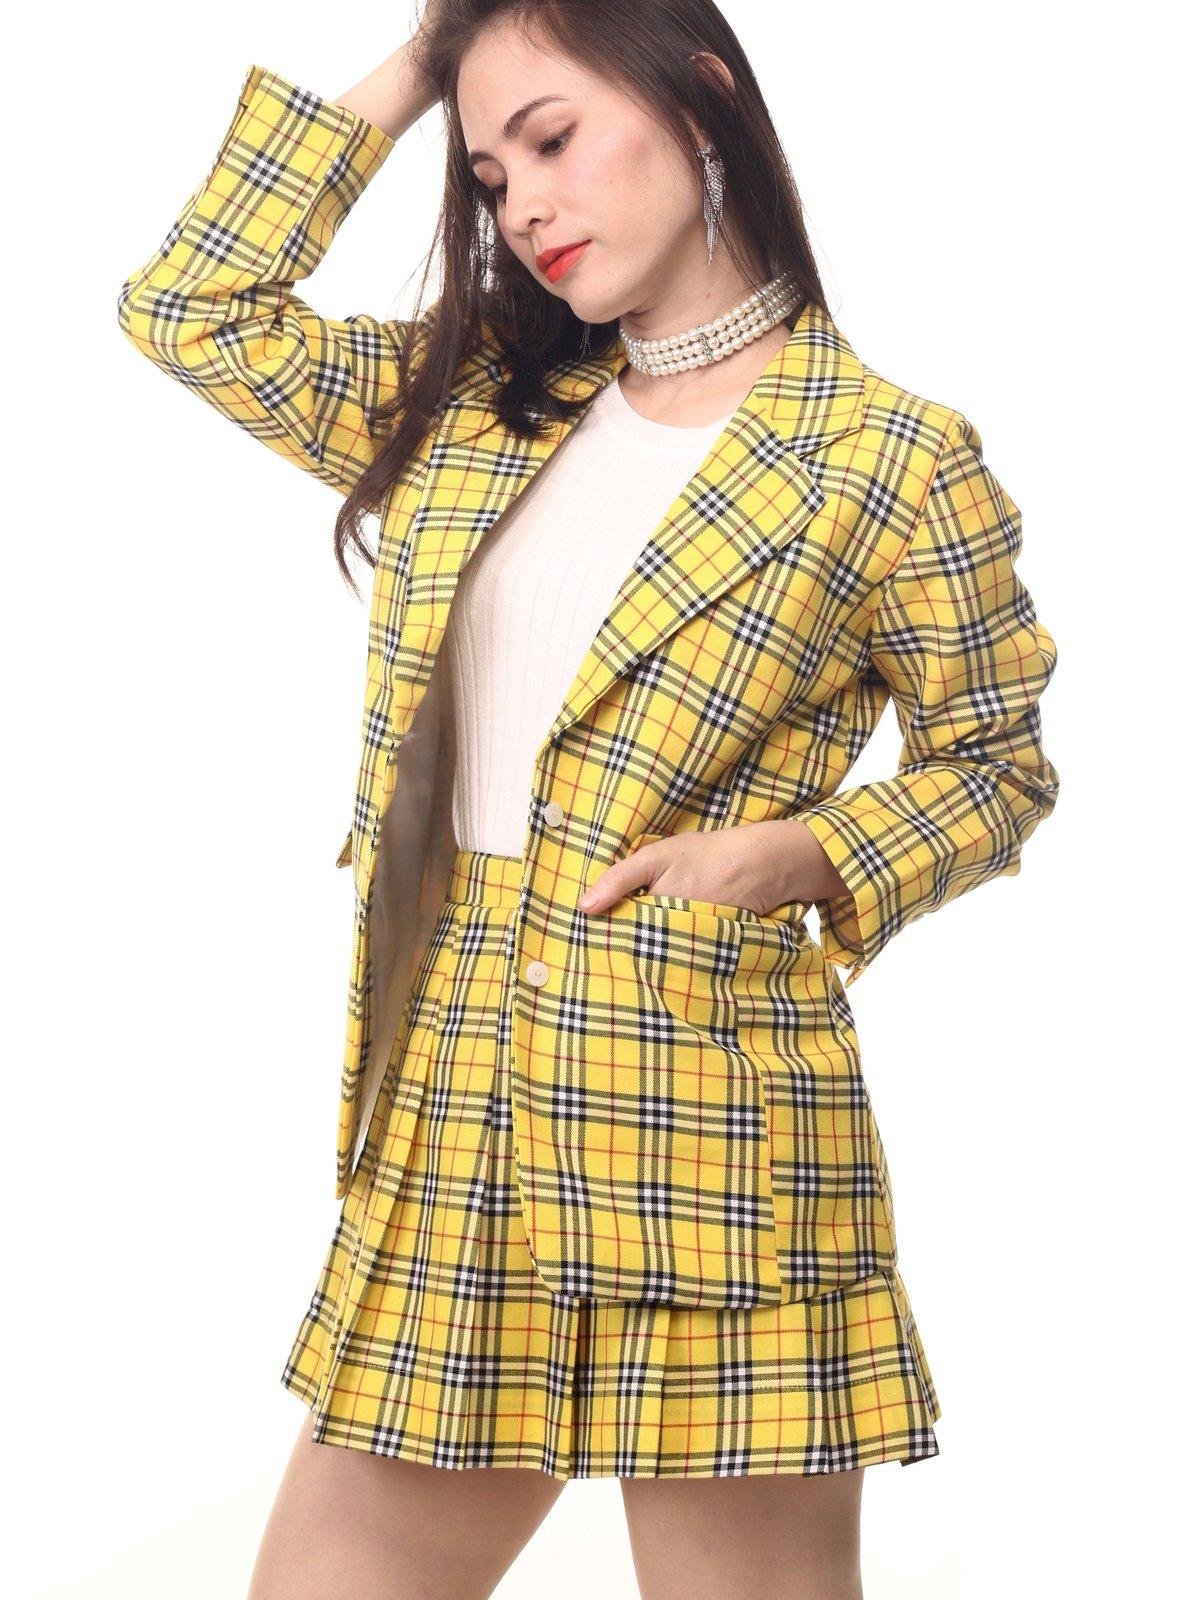 cher long blazer in yellow tartan